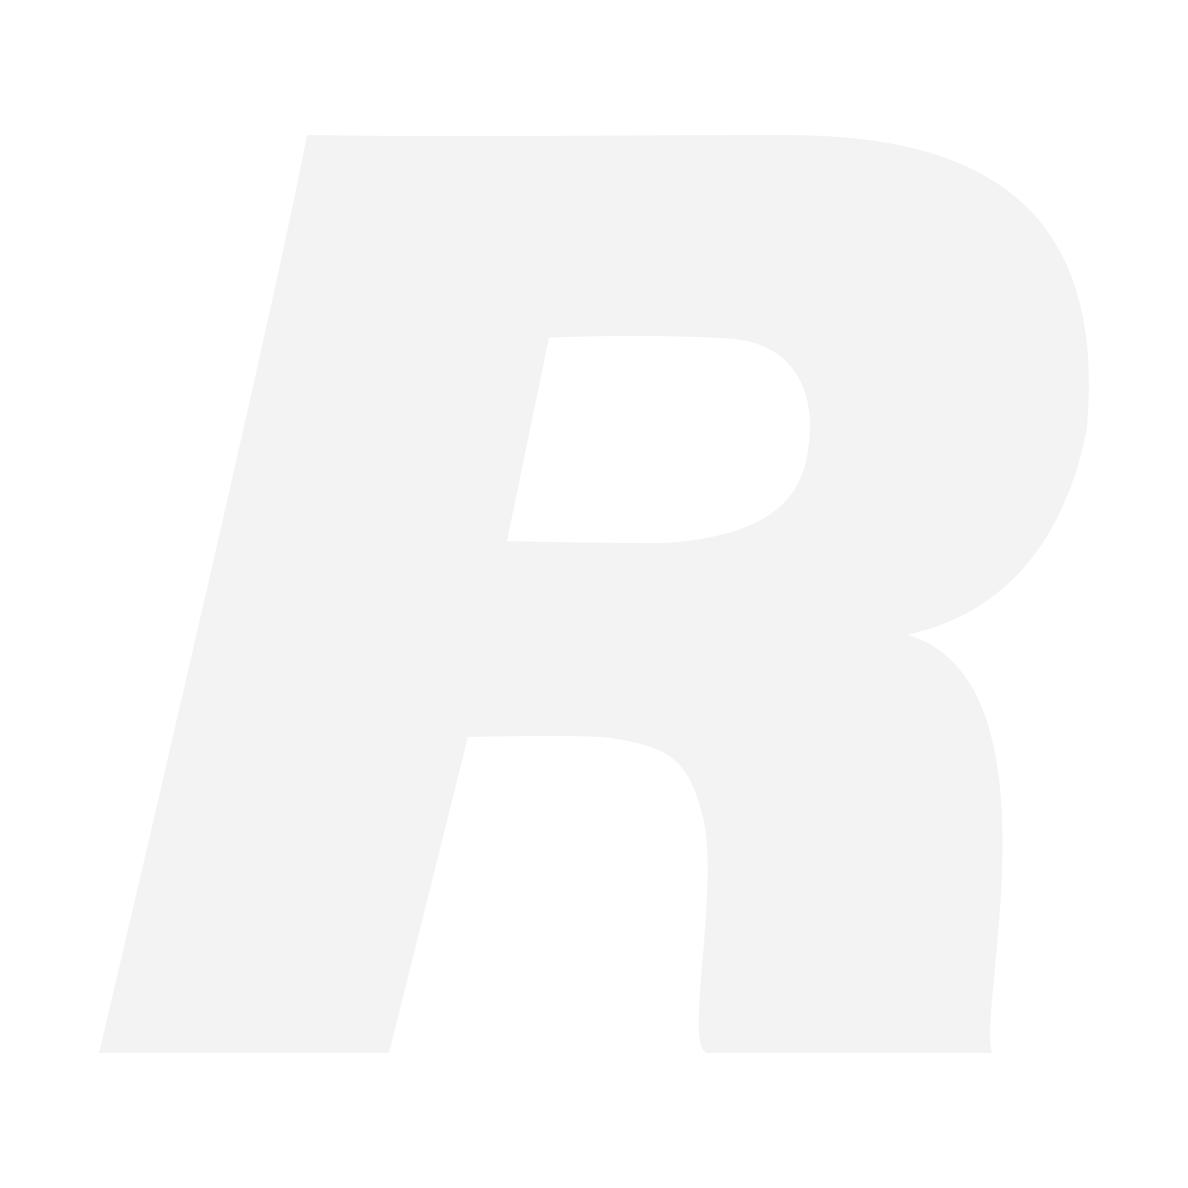 Elinchrom E26117 Rotalux Rotagrid 70x70 cm (for E26178)